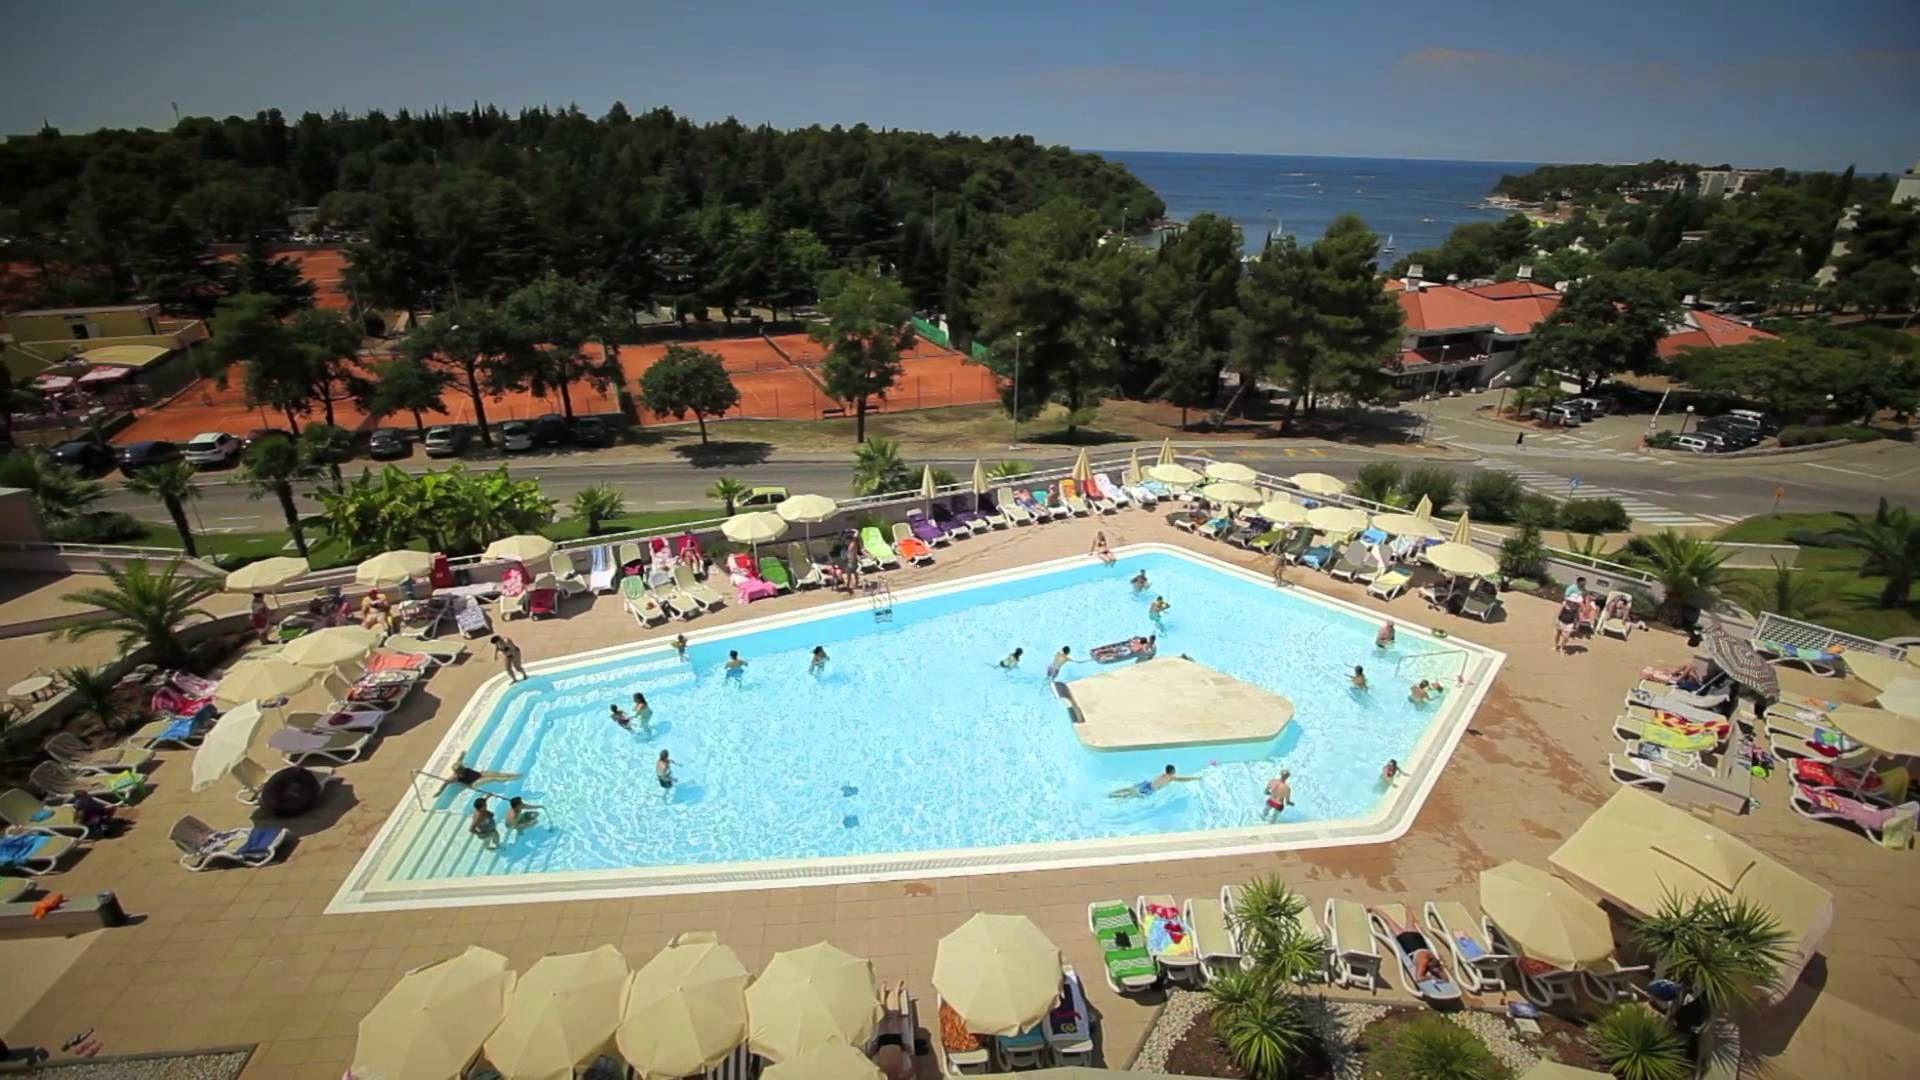 Hotel Laguna Albatros Video Summer Vacation Fun Sea Hotel Family Porec Istria Croatia Porec Best Vacations Vacation